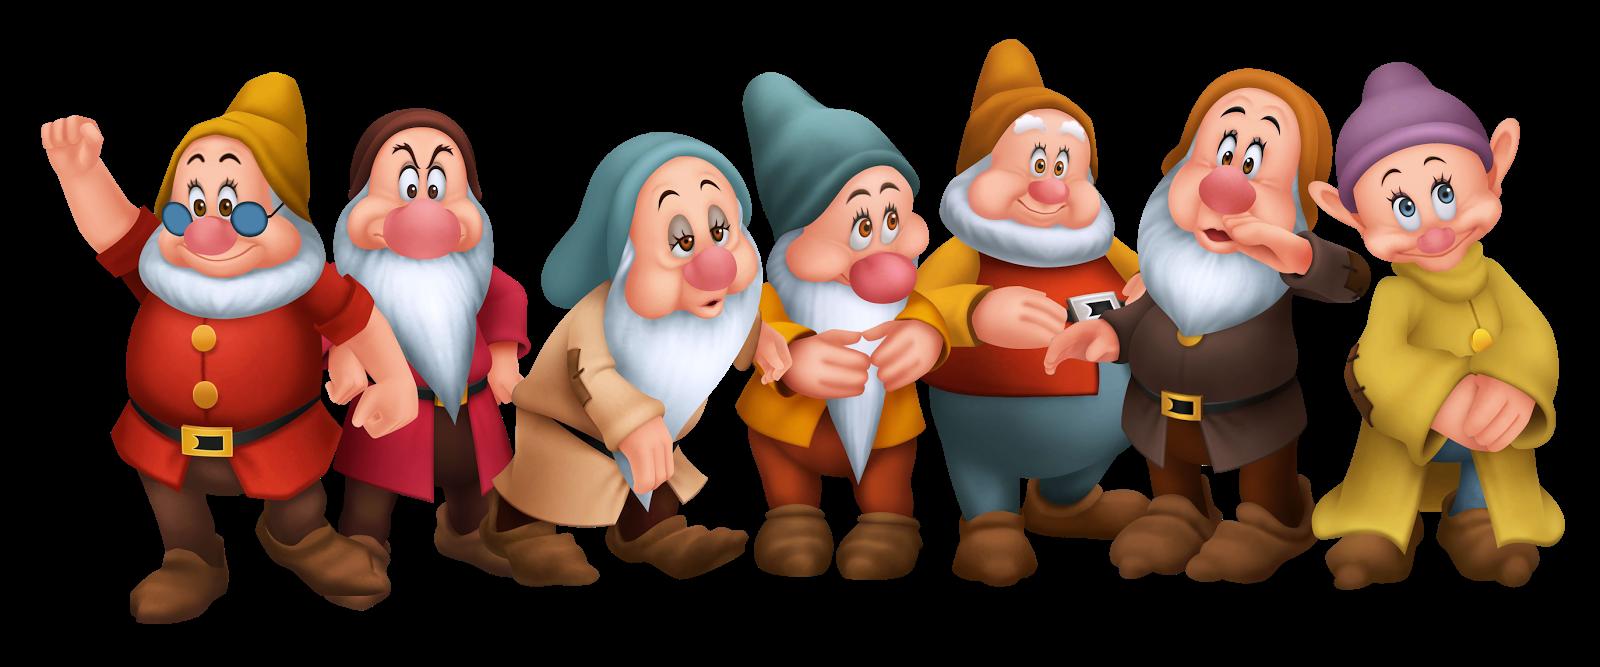 Seven Dwarfs Png & Free Seven Dwarfs.png Transparent Images.